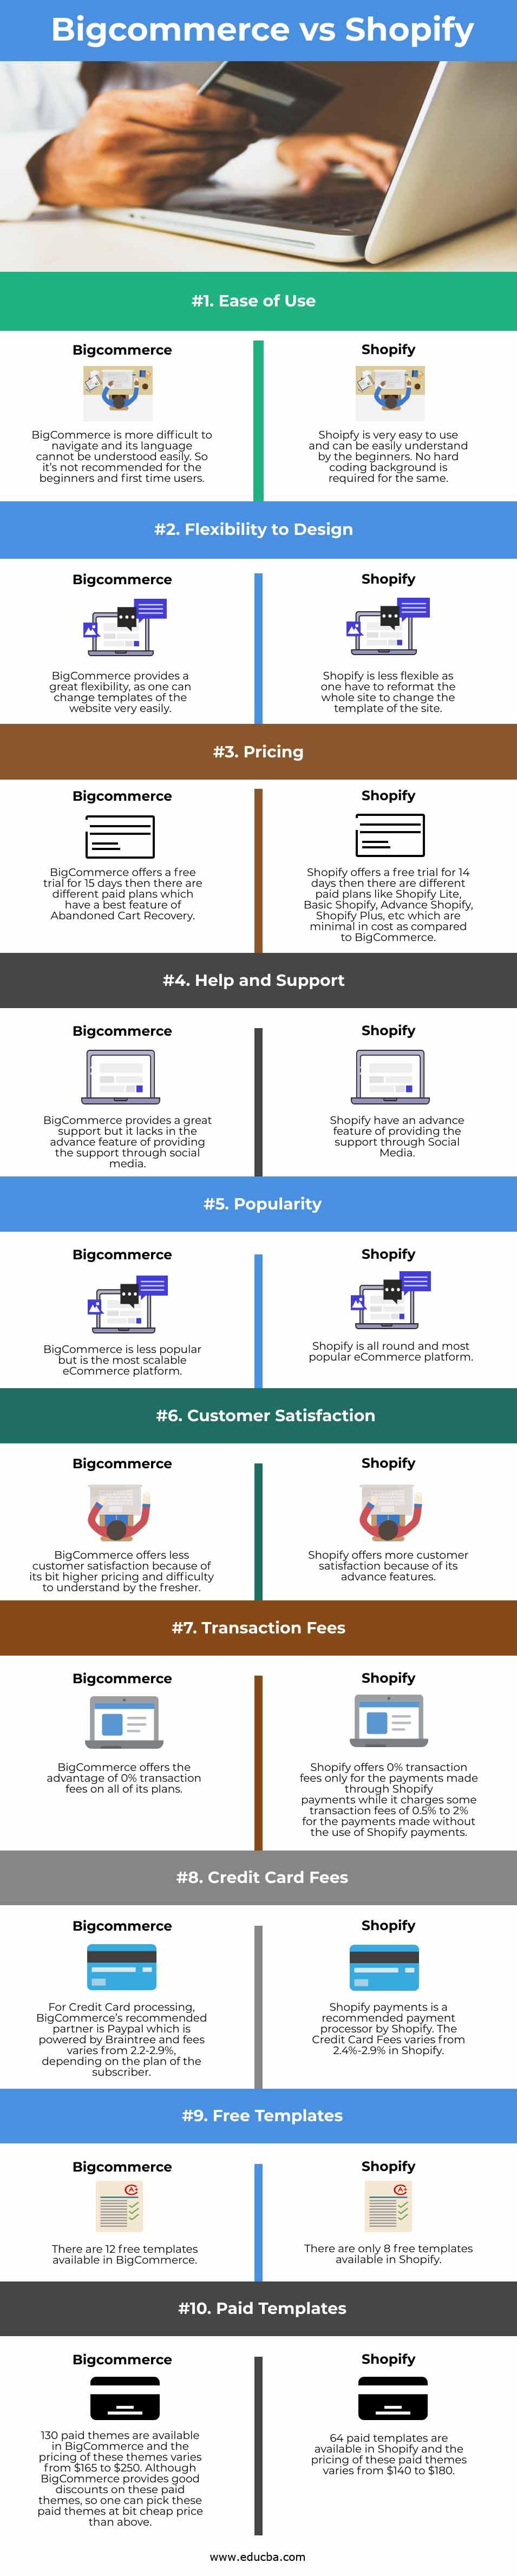 Bigcommerce vs Shopify info